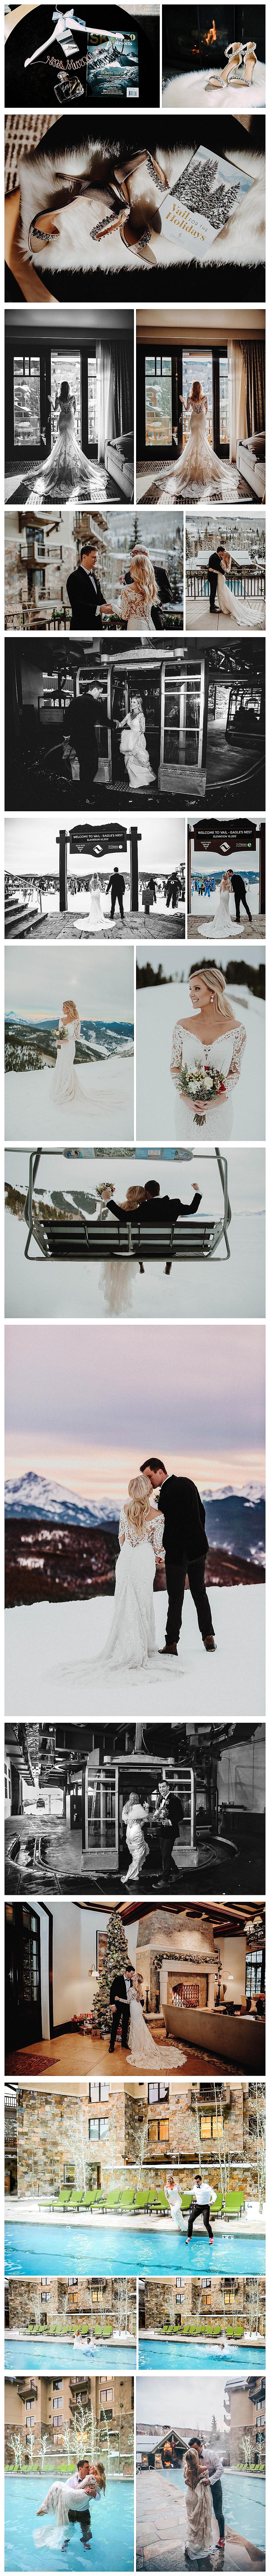 Vail Christmas Elopement Photographer - Vail Winter Wedding Photographer - Four Seasons Vail Wedding